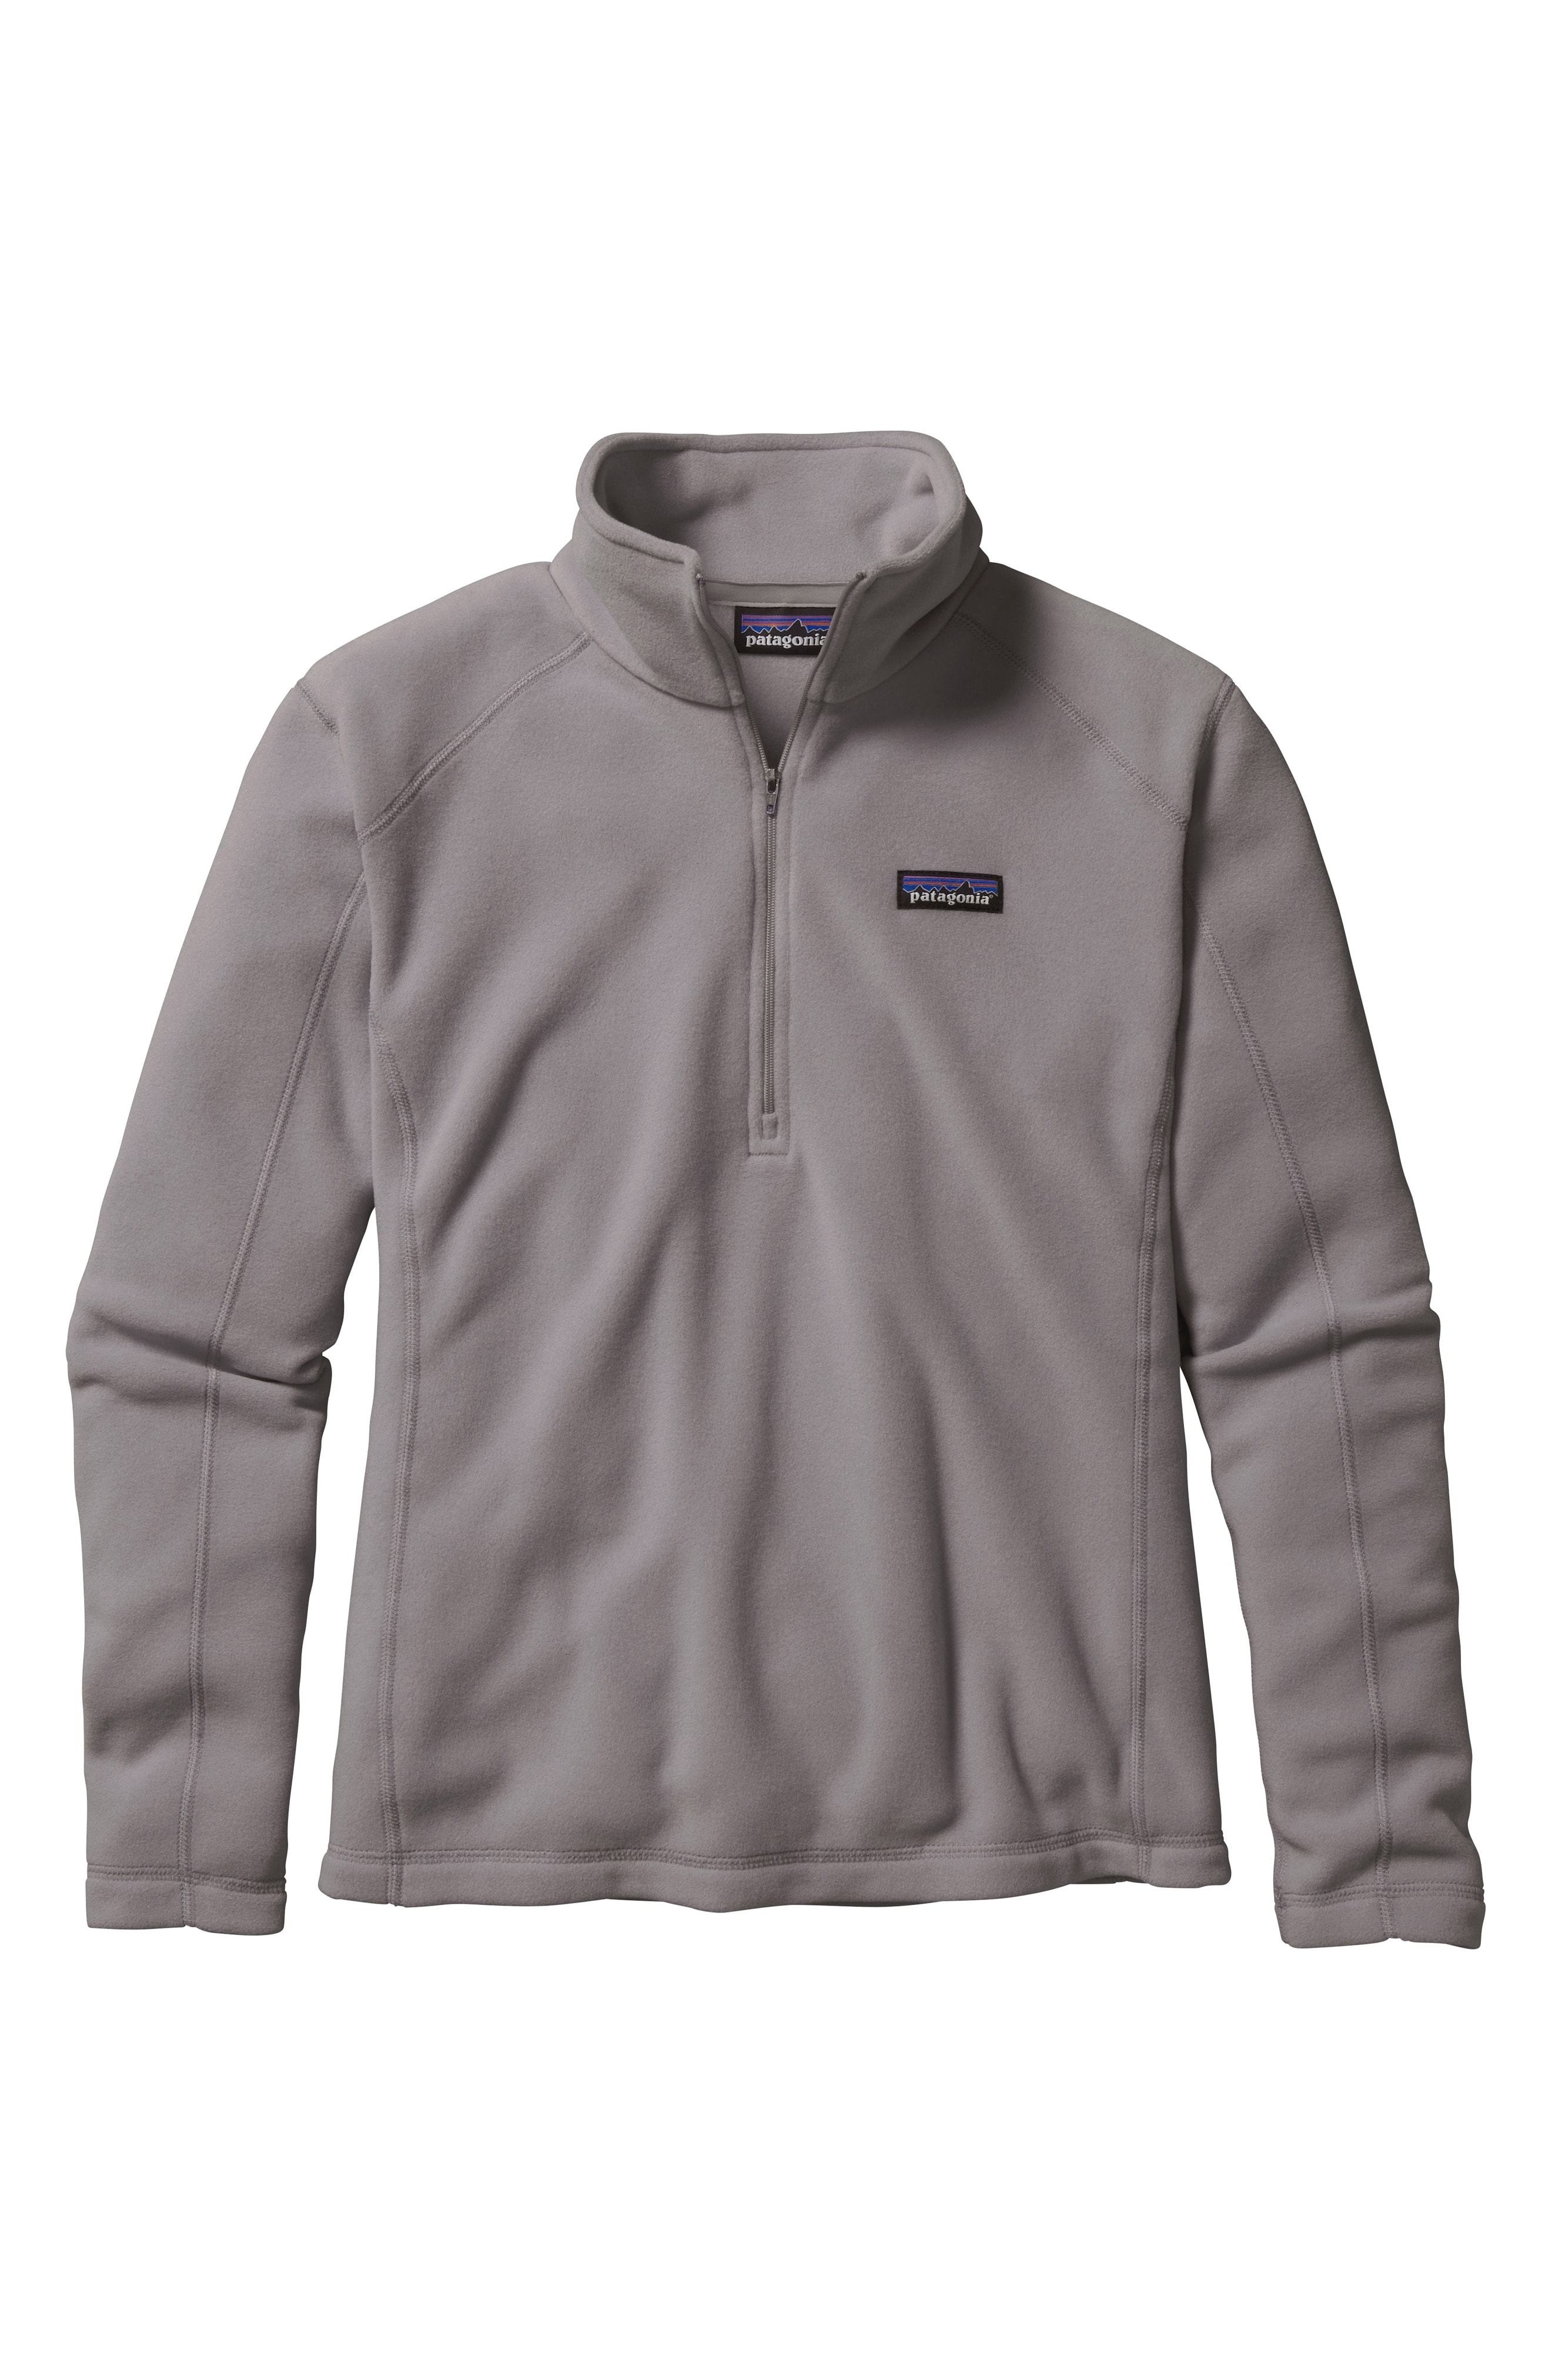 Patagonia Micro D Quarter-Zip Fleece Pullover In Feather Grey